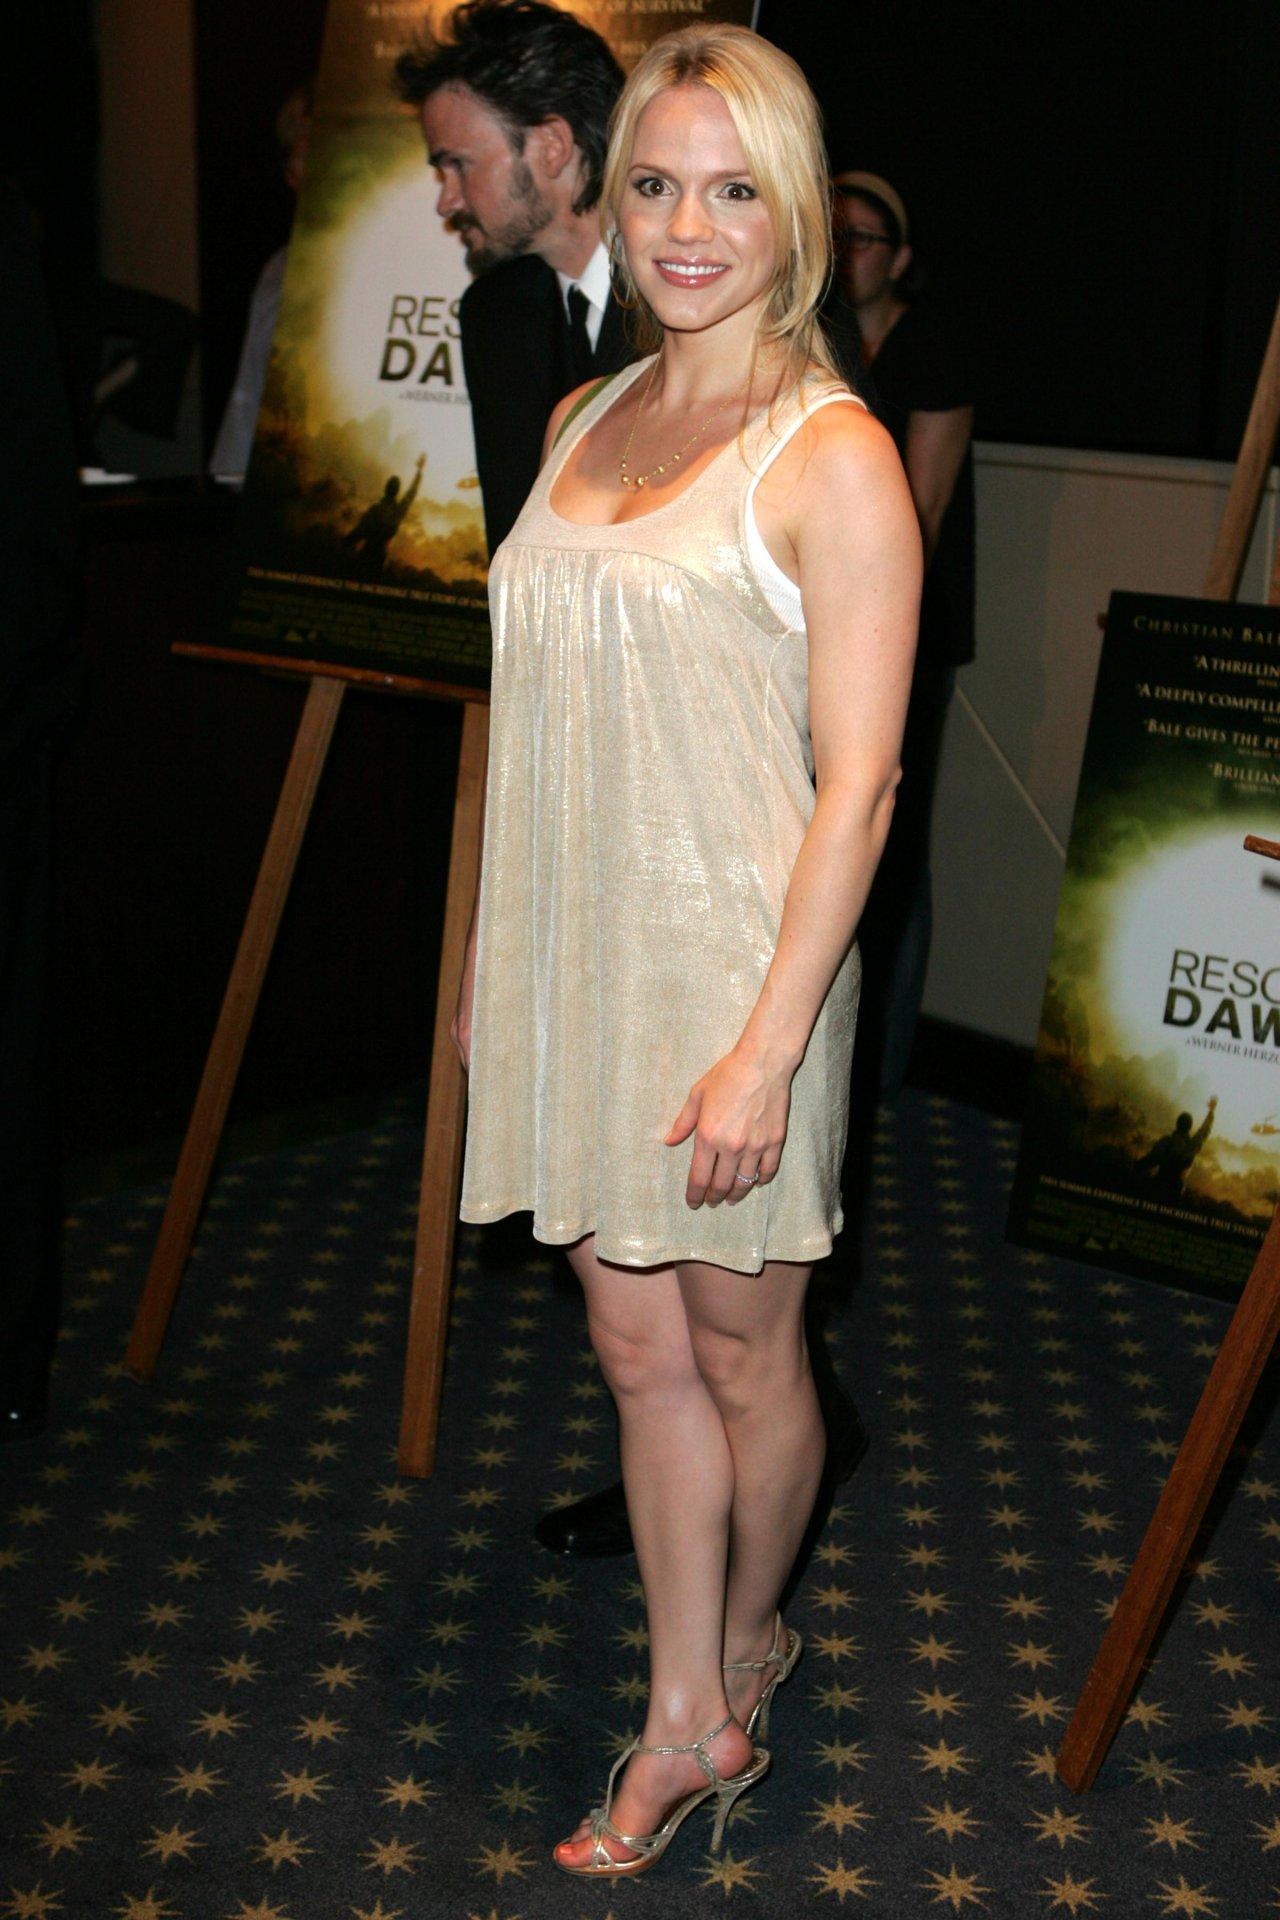 Judi Evans born July 12, 1964 (age 54) recommendations